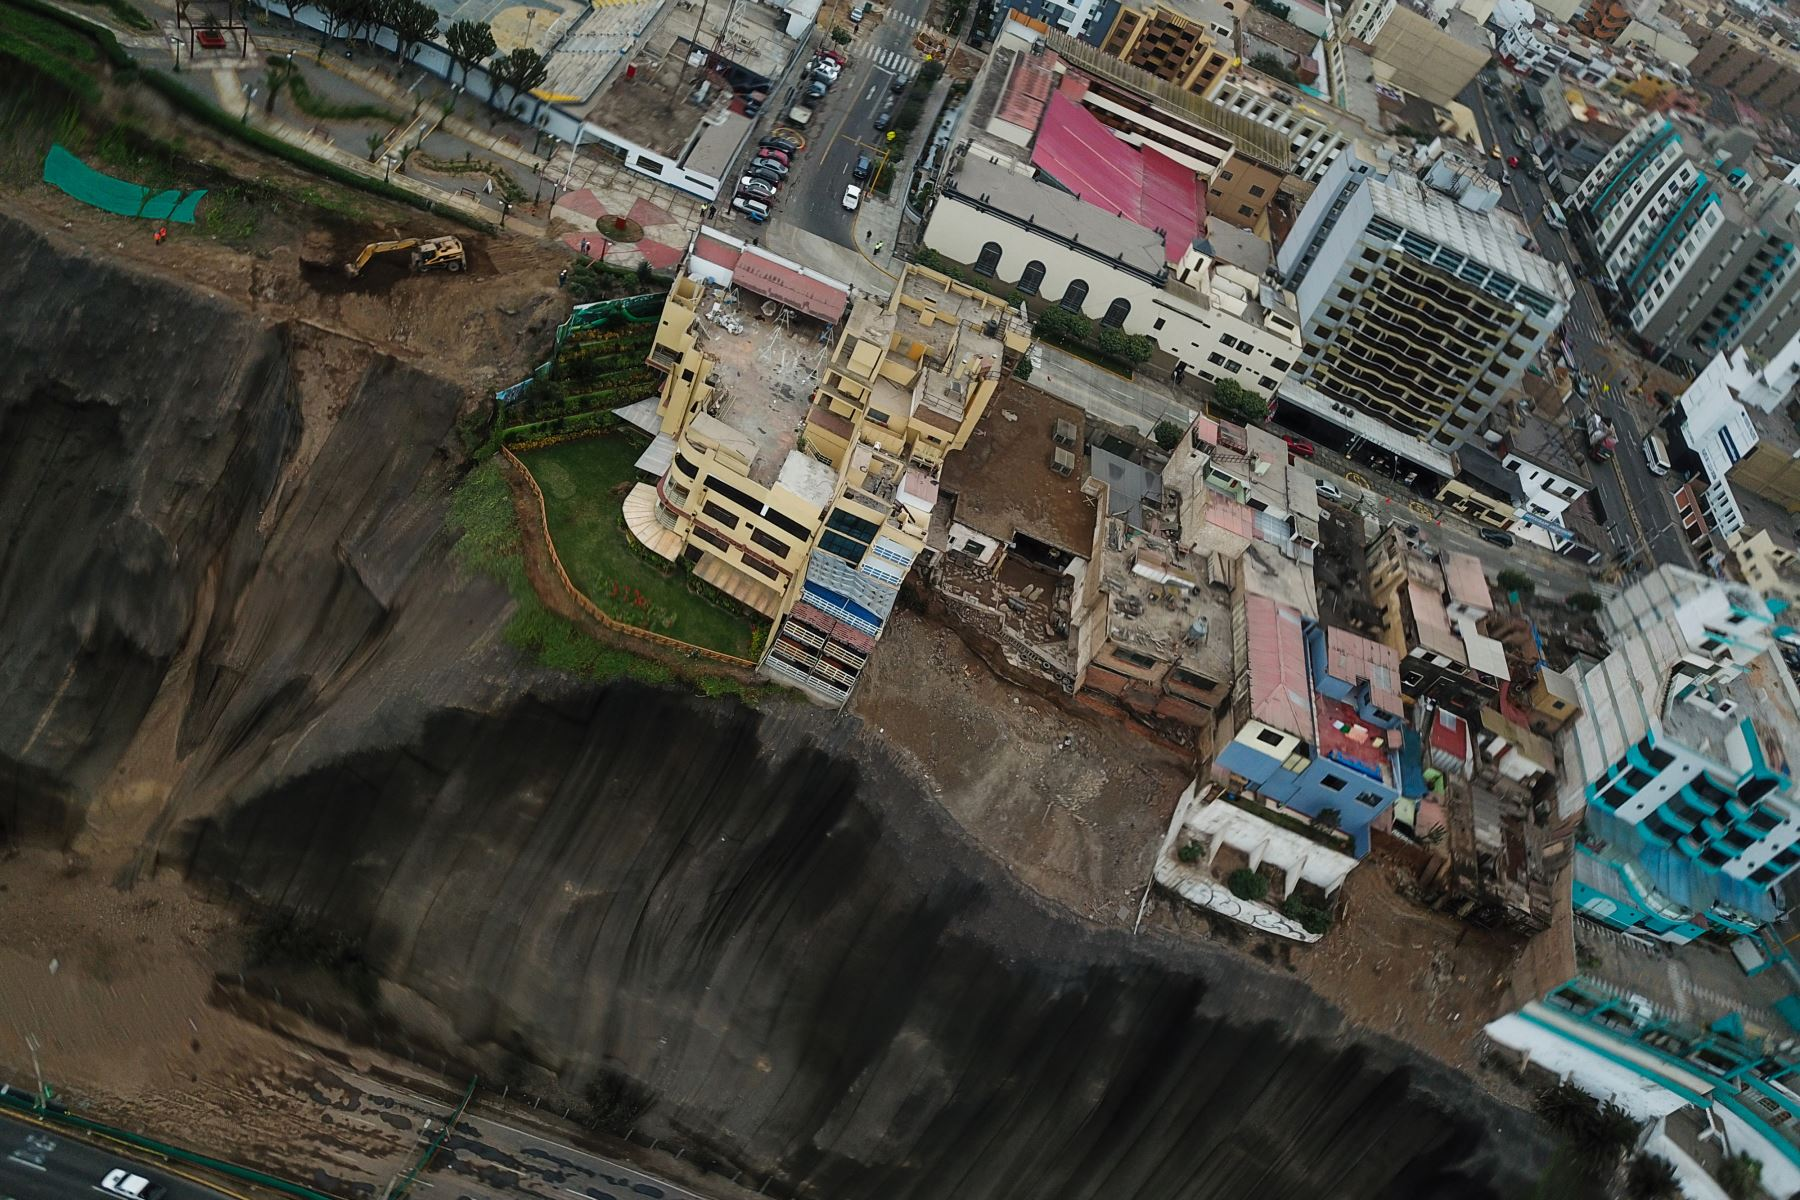 Entidades técnicas evaluarán situación de acantilados. Foto: ANDINA/Juan Carlos Guzmán.